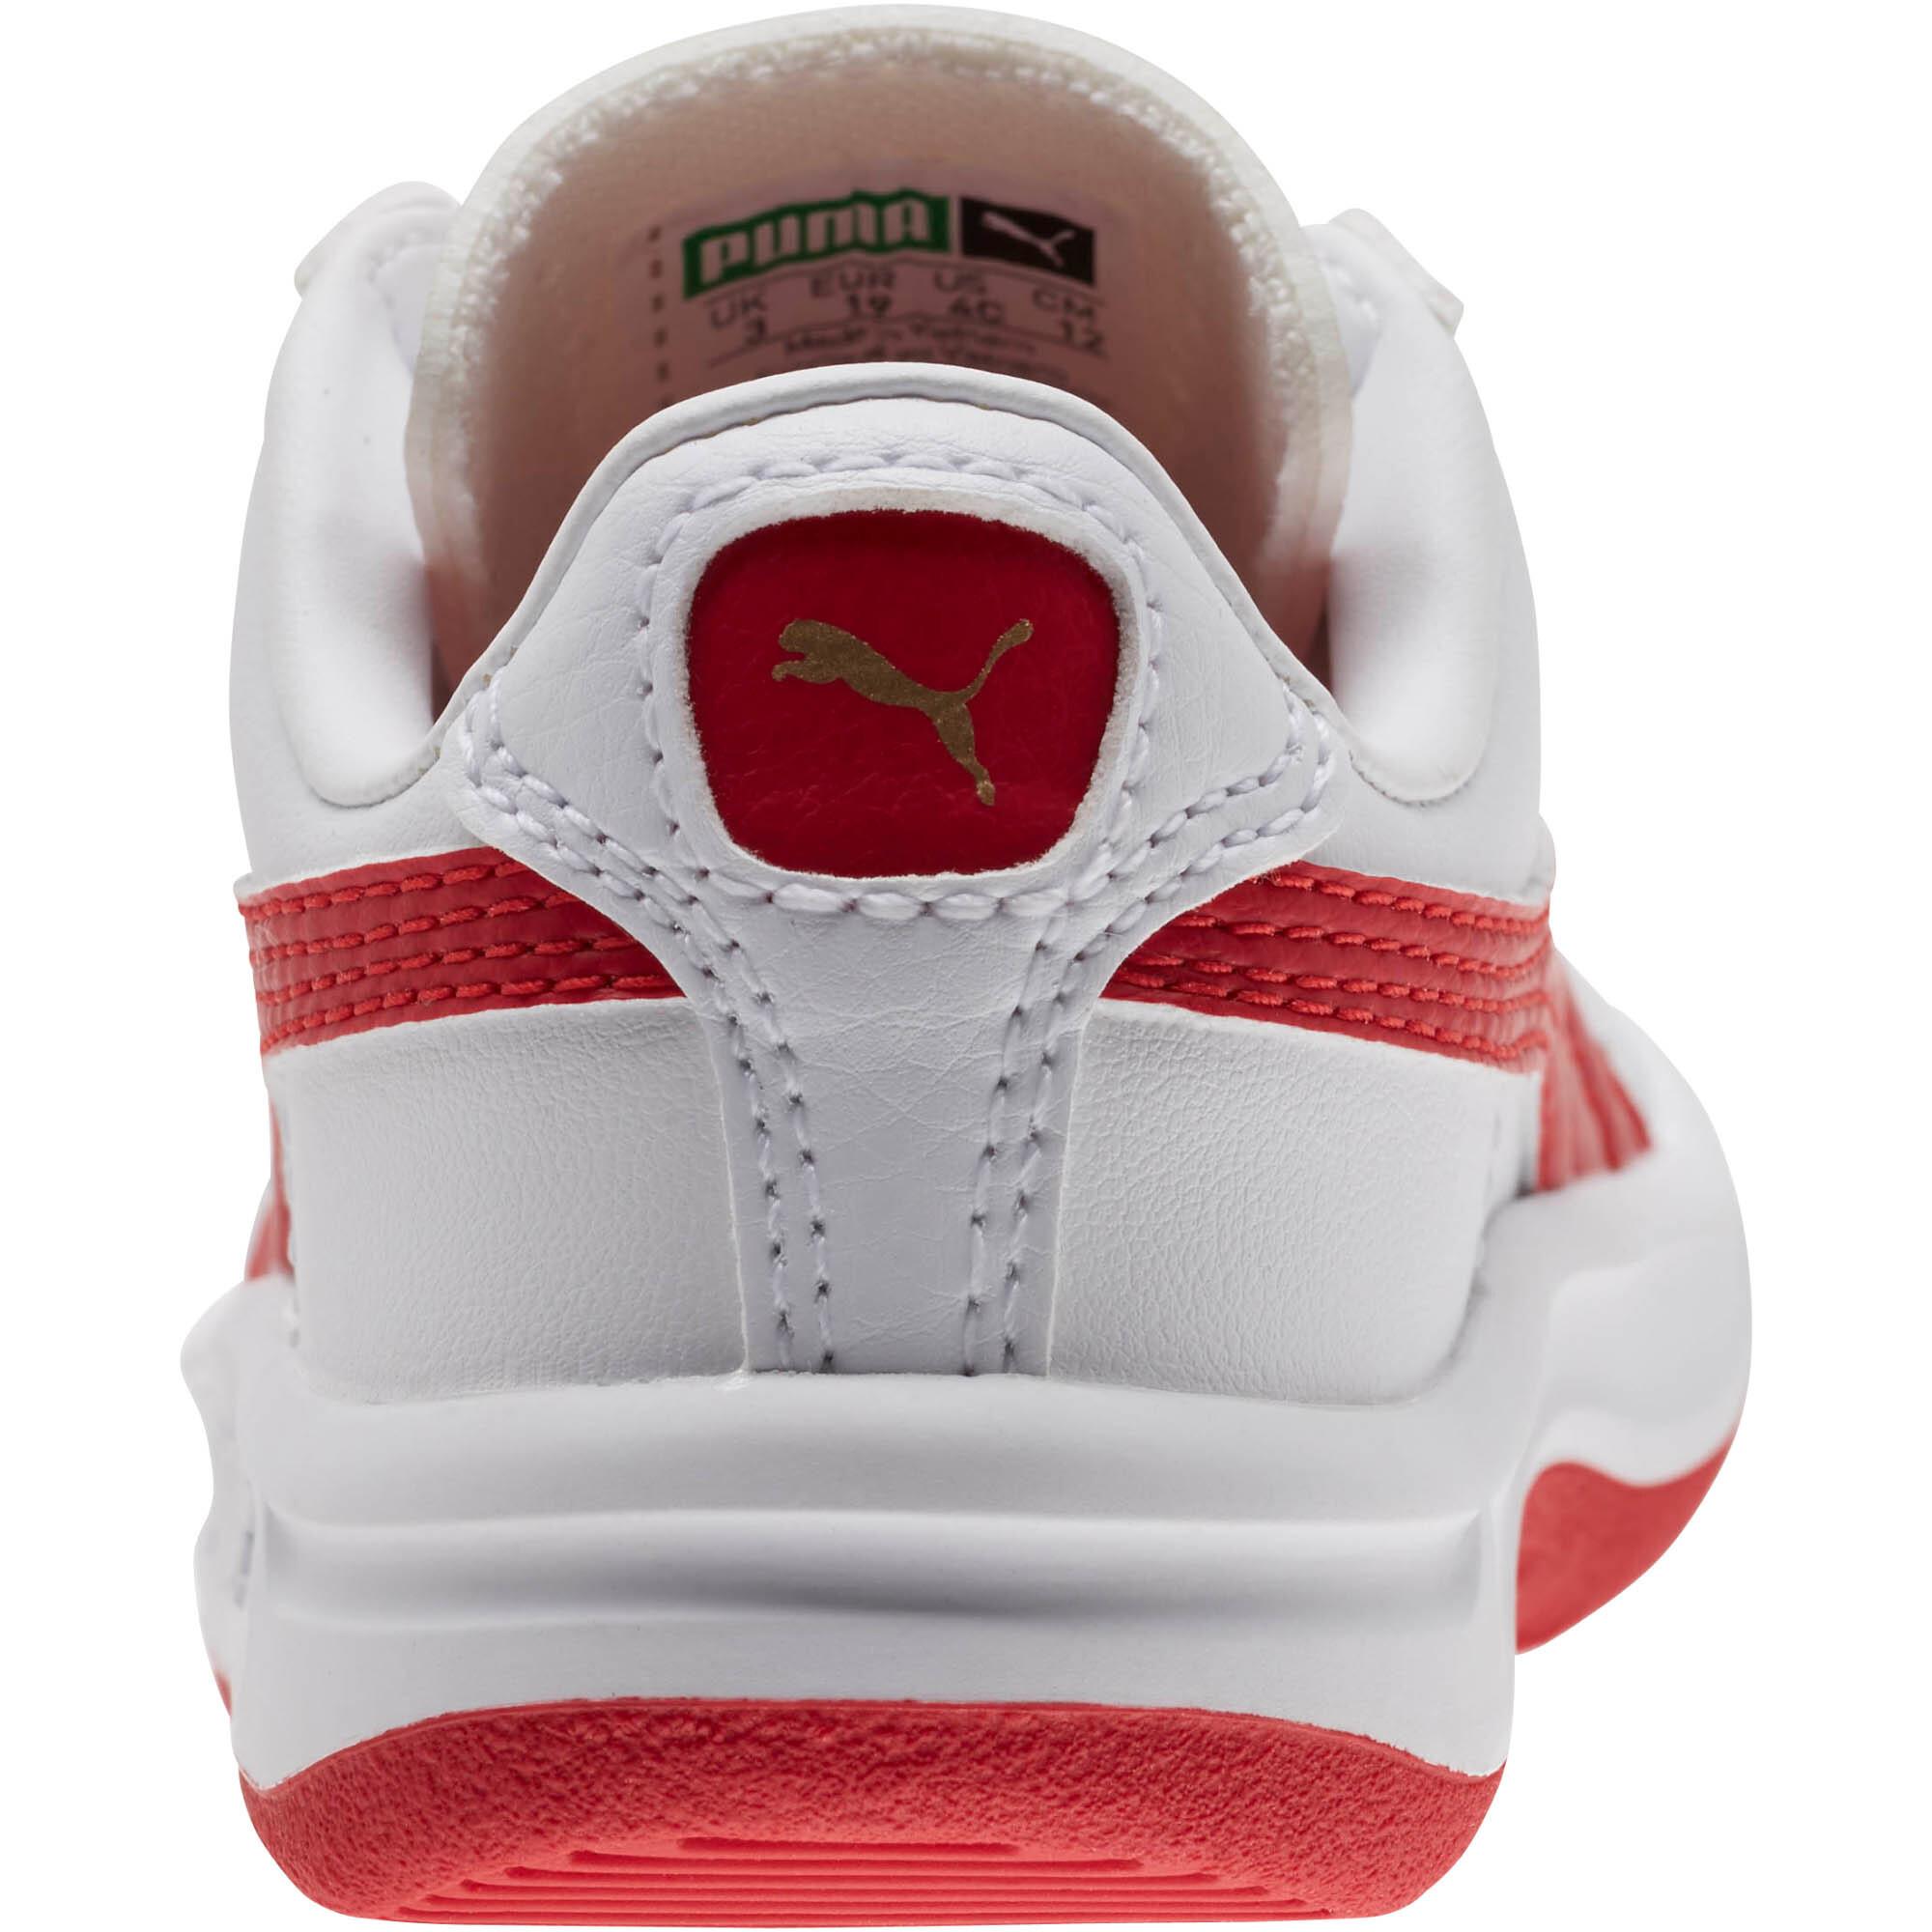 PUMA-Infant-GV-Special-Shoes thumbnail 3